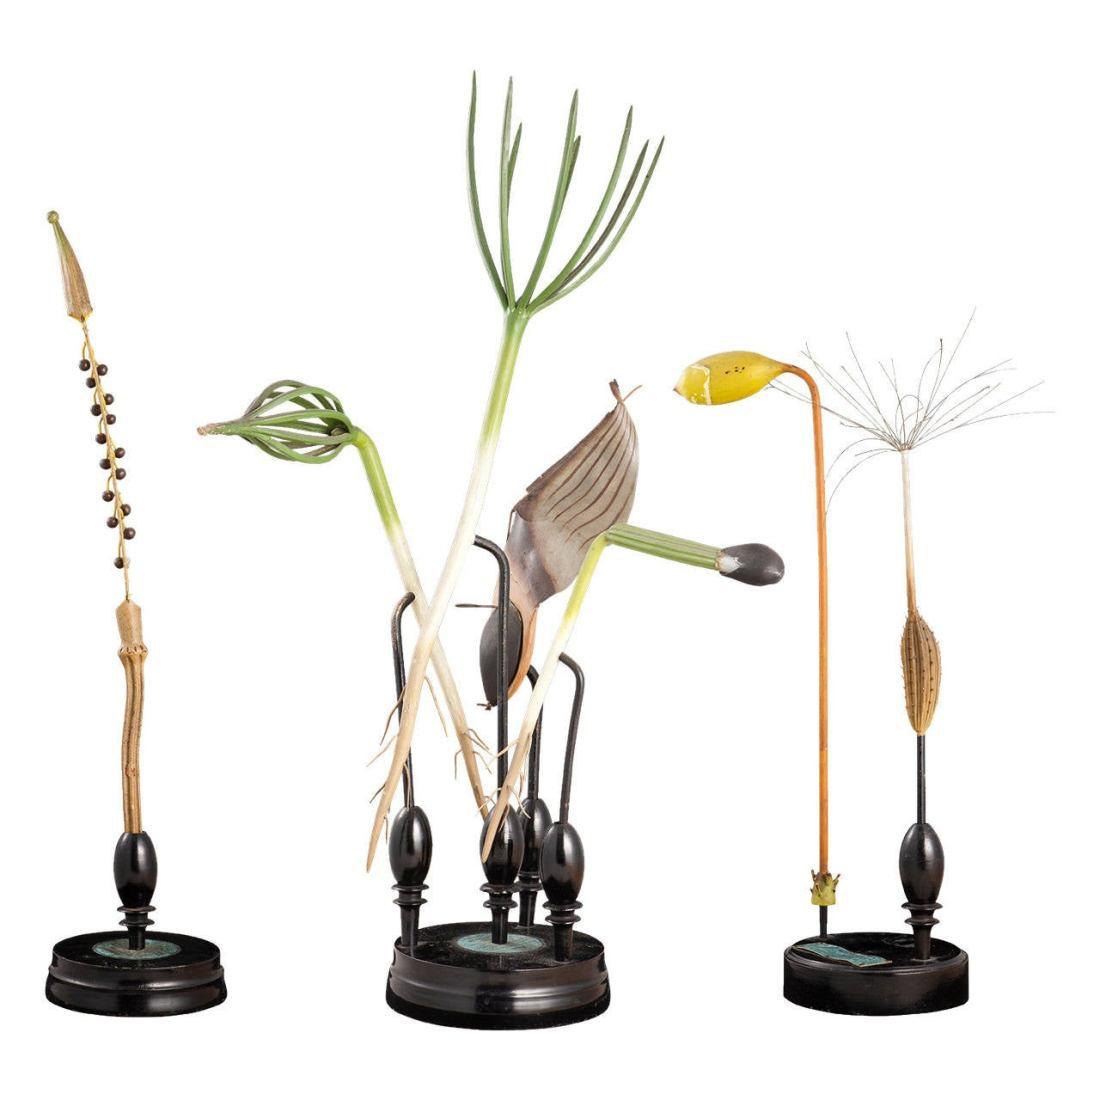 Three botanical models.